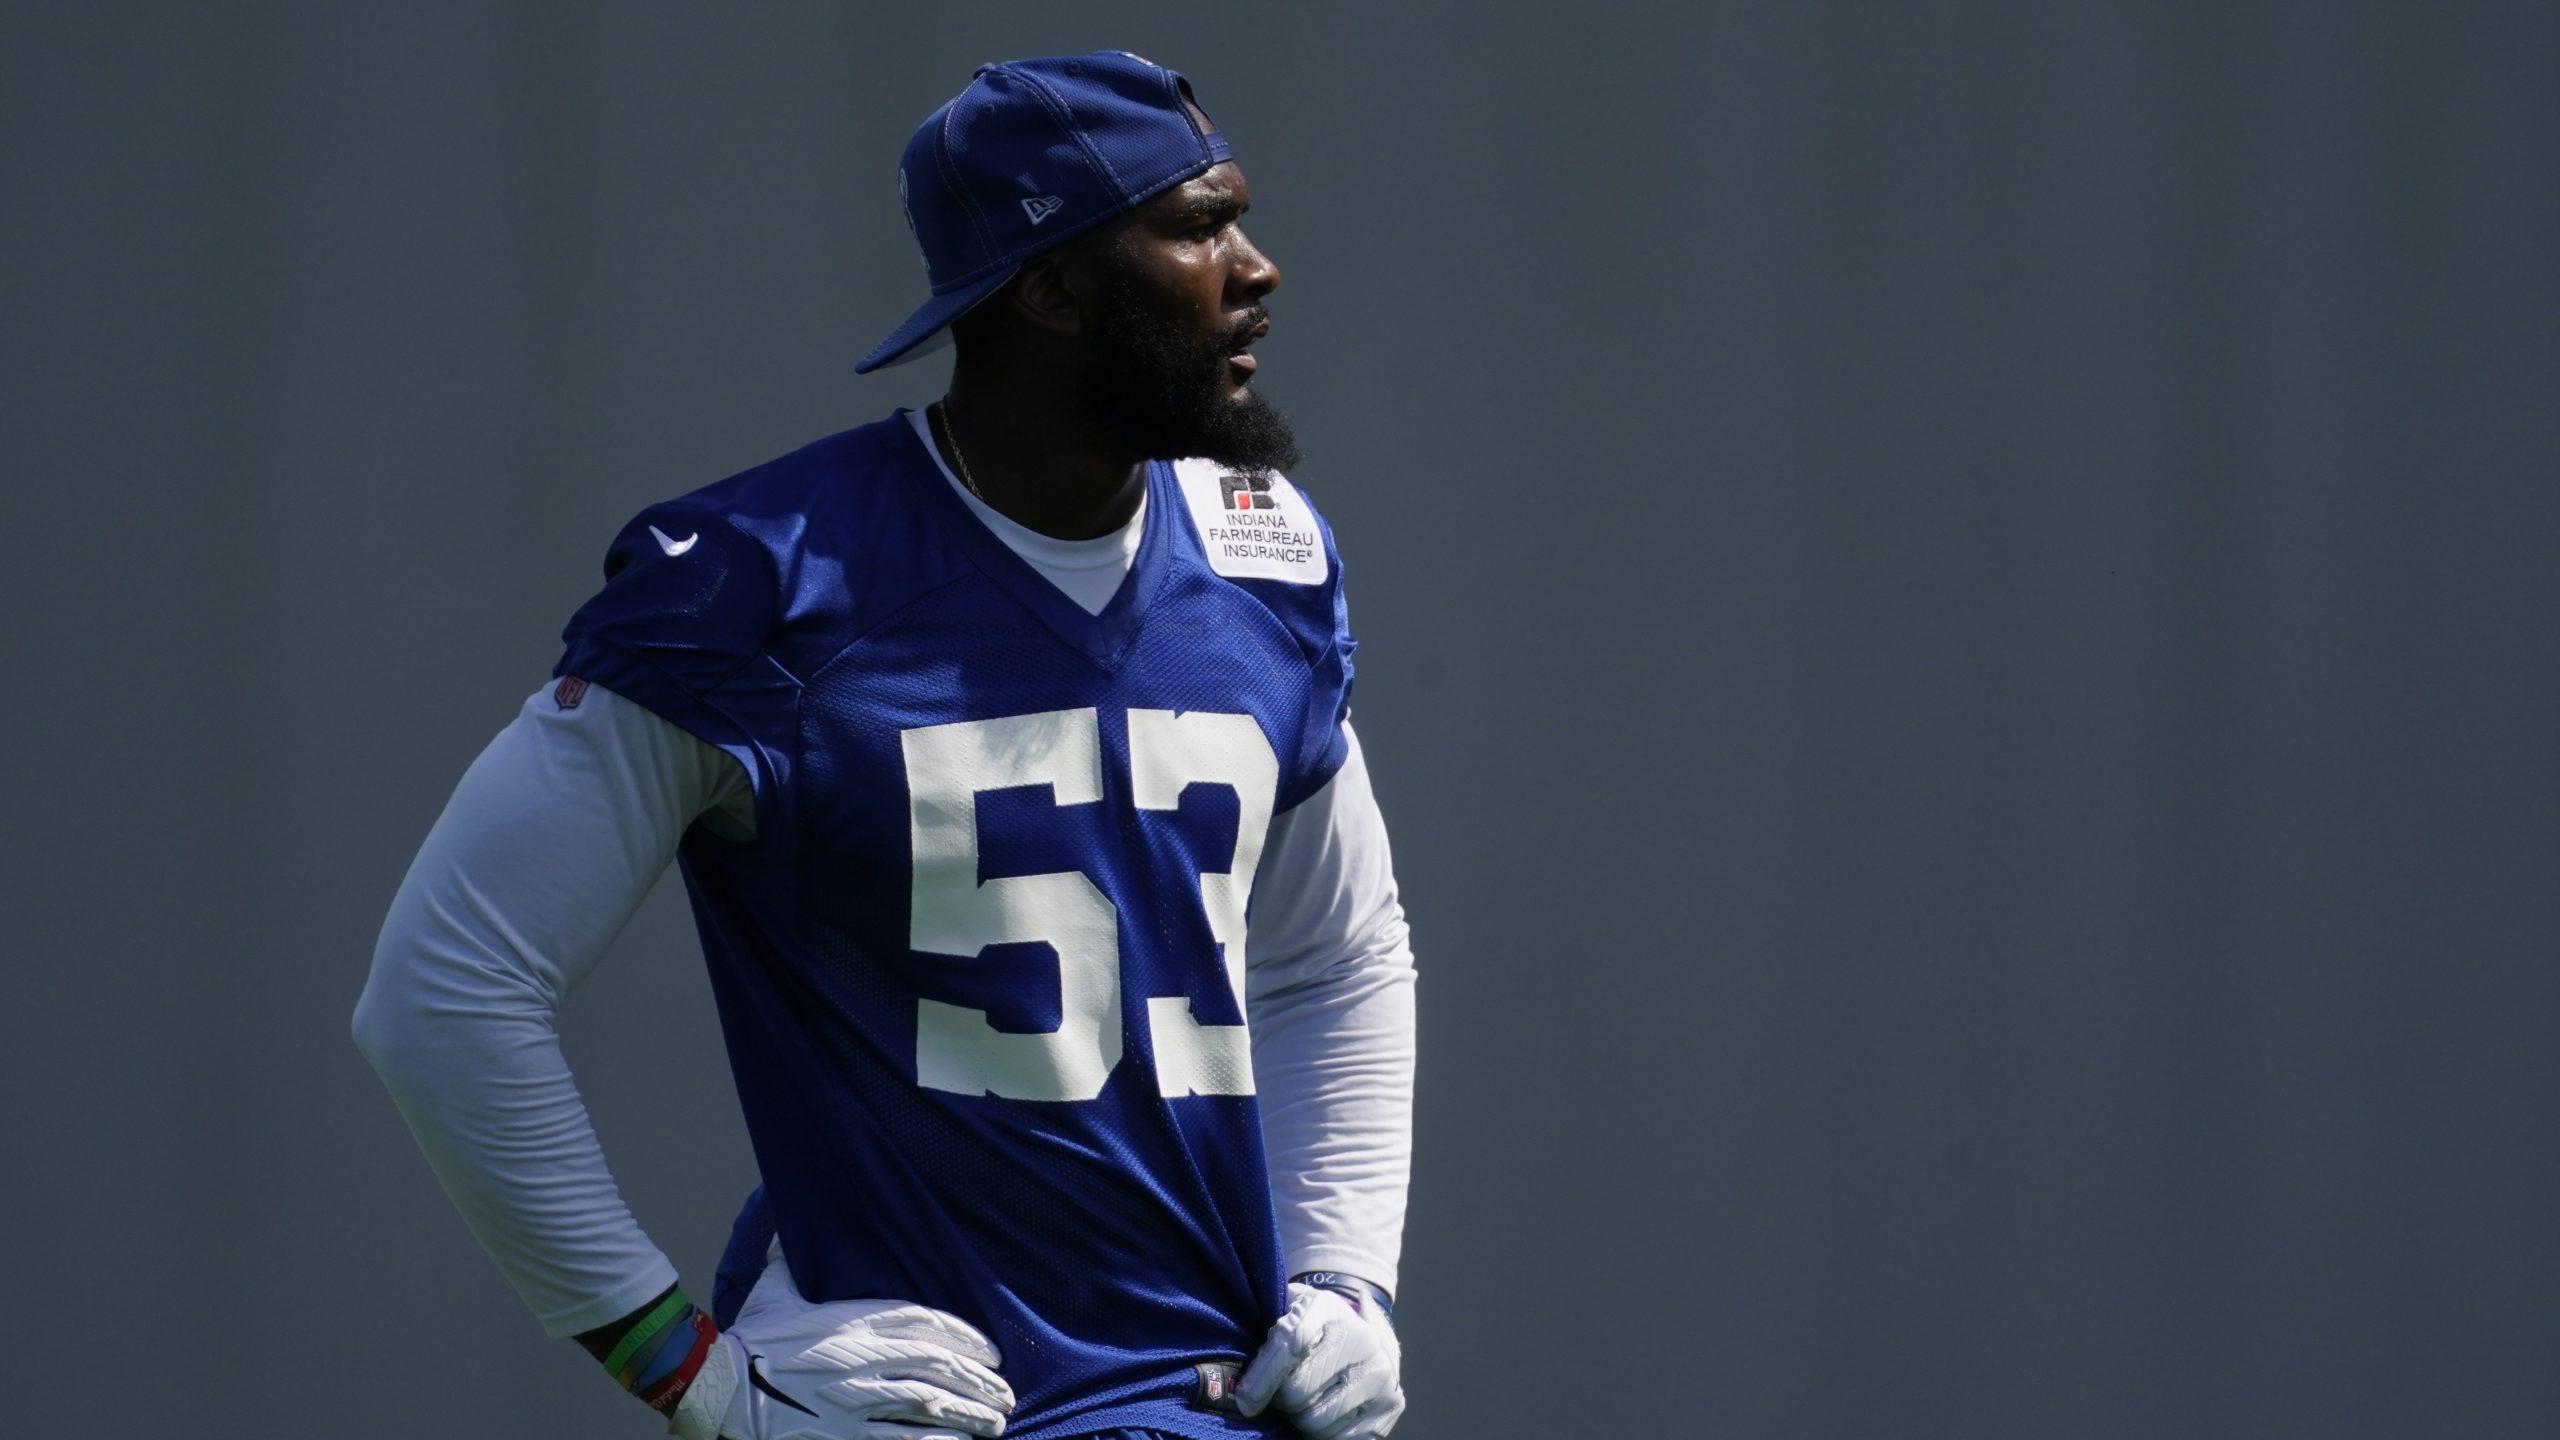 Indianapolis Colts linebacker Darius Leonard